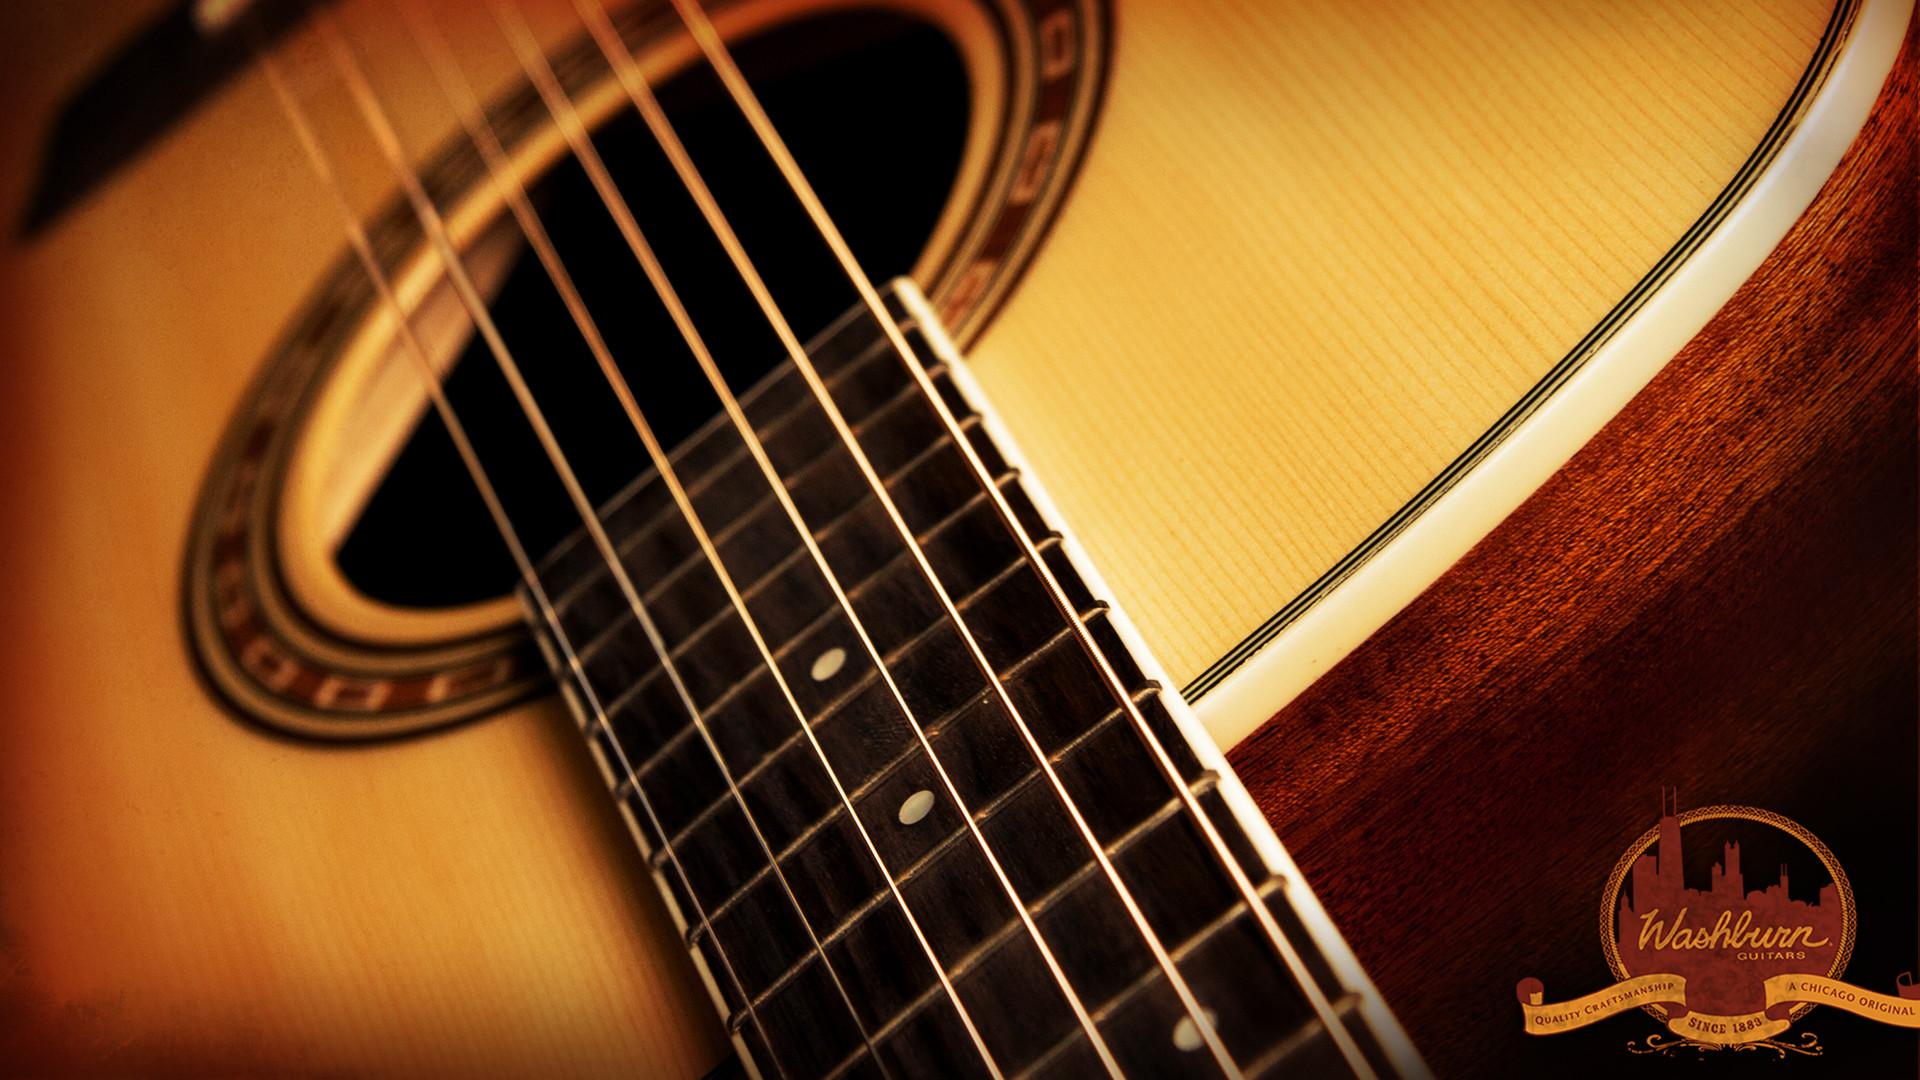 Washburn Guitars Wallpaper